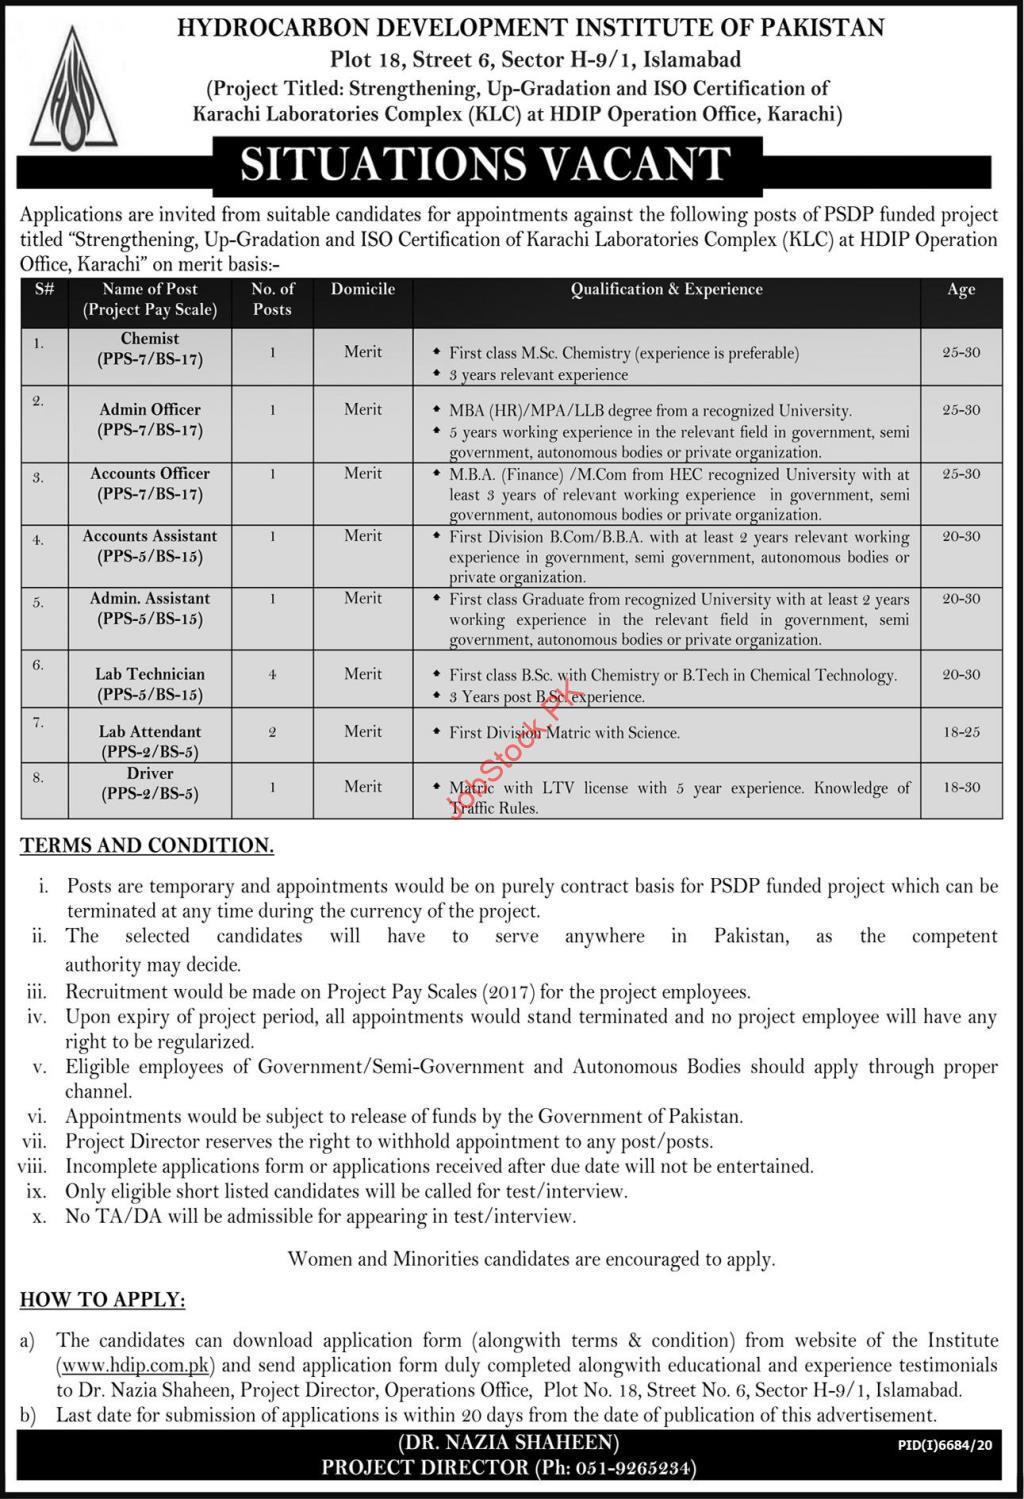 Hydrocarbon Development Institute Of Pakistan Jobs 2020 Application Form Download